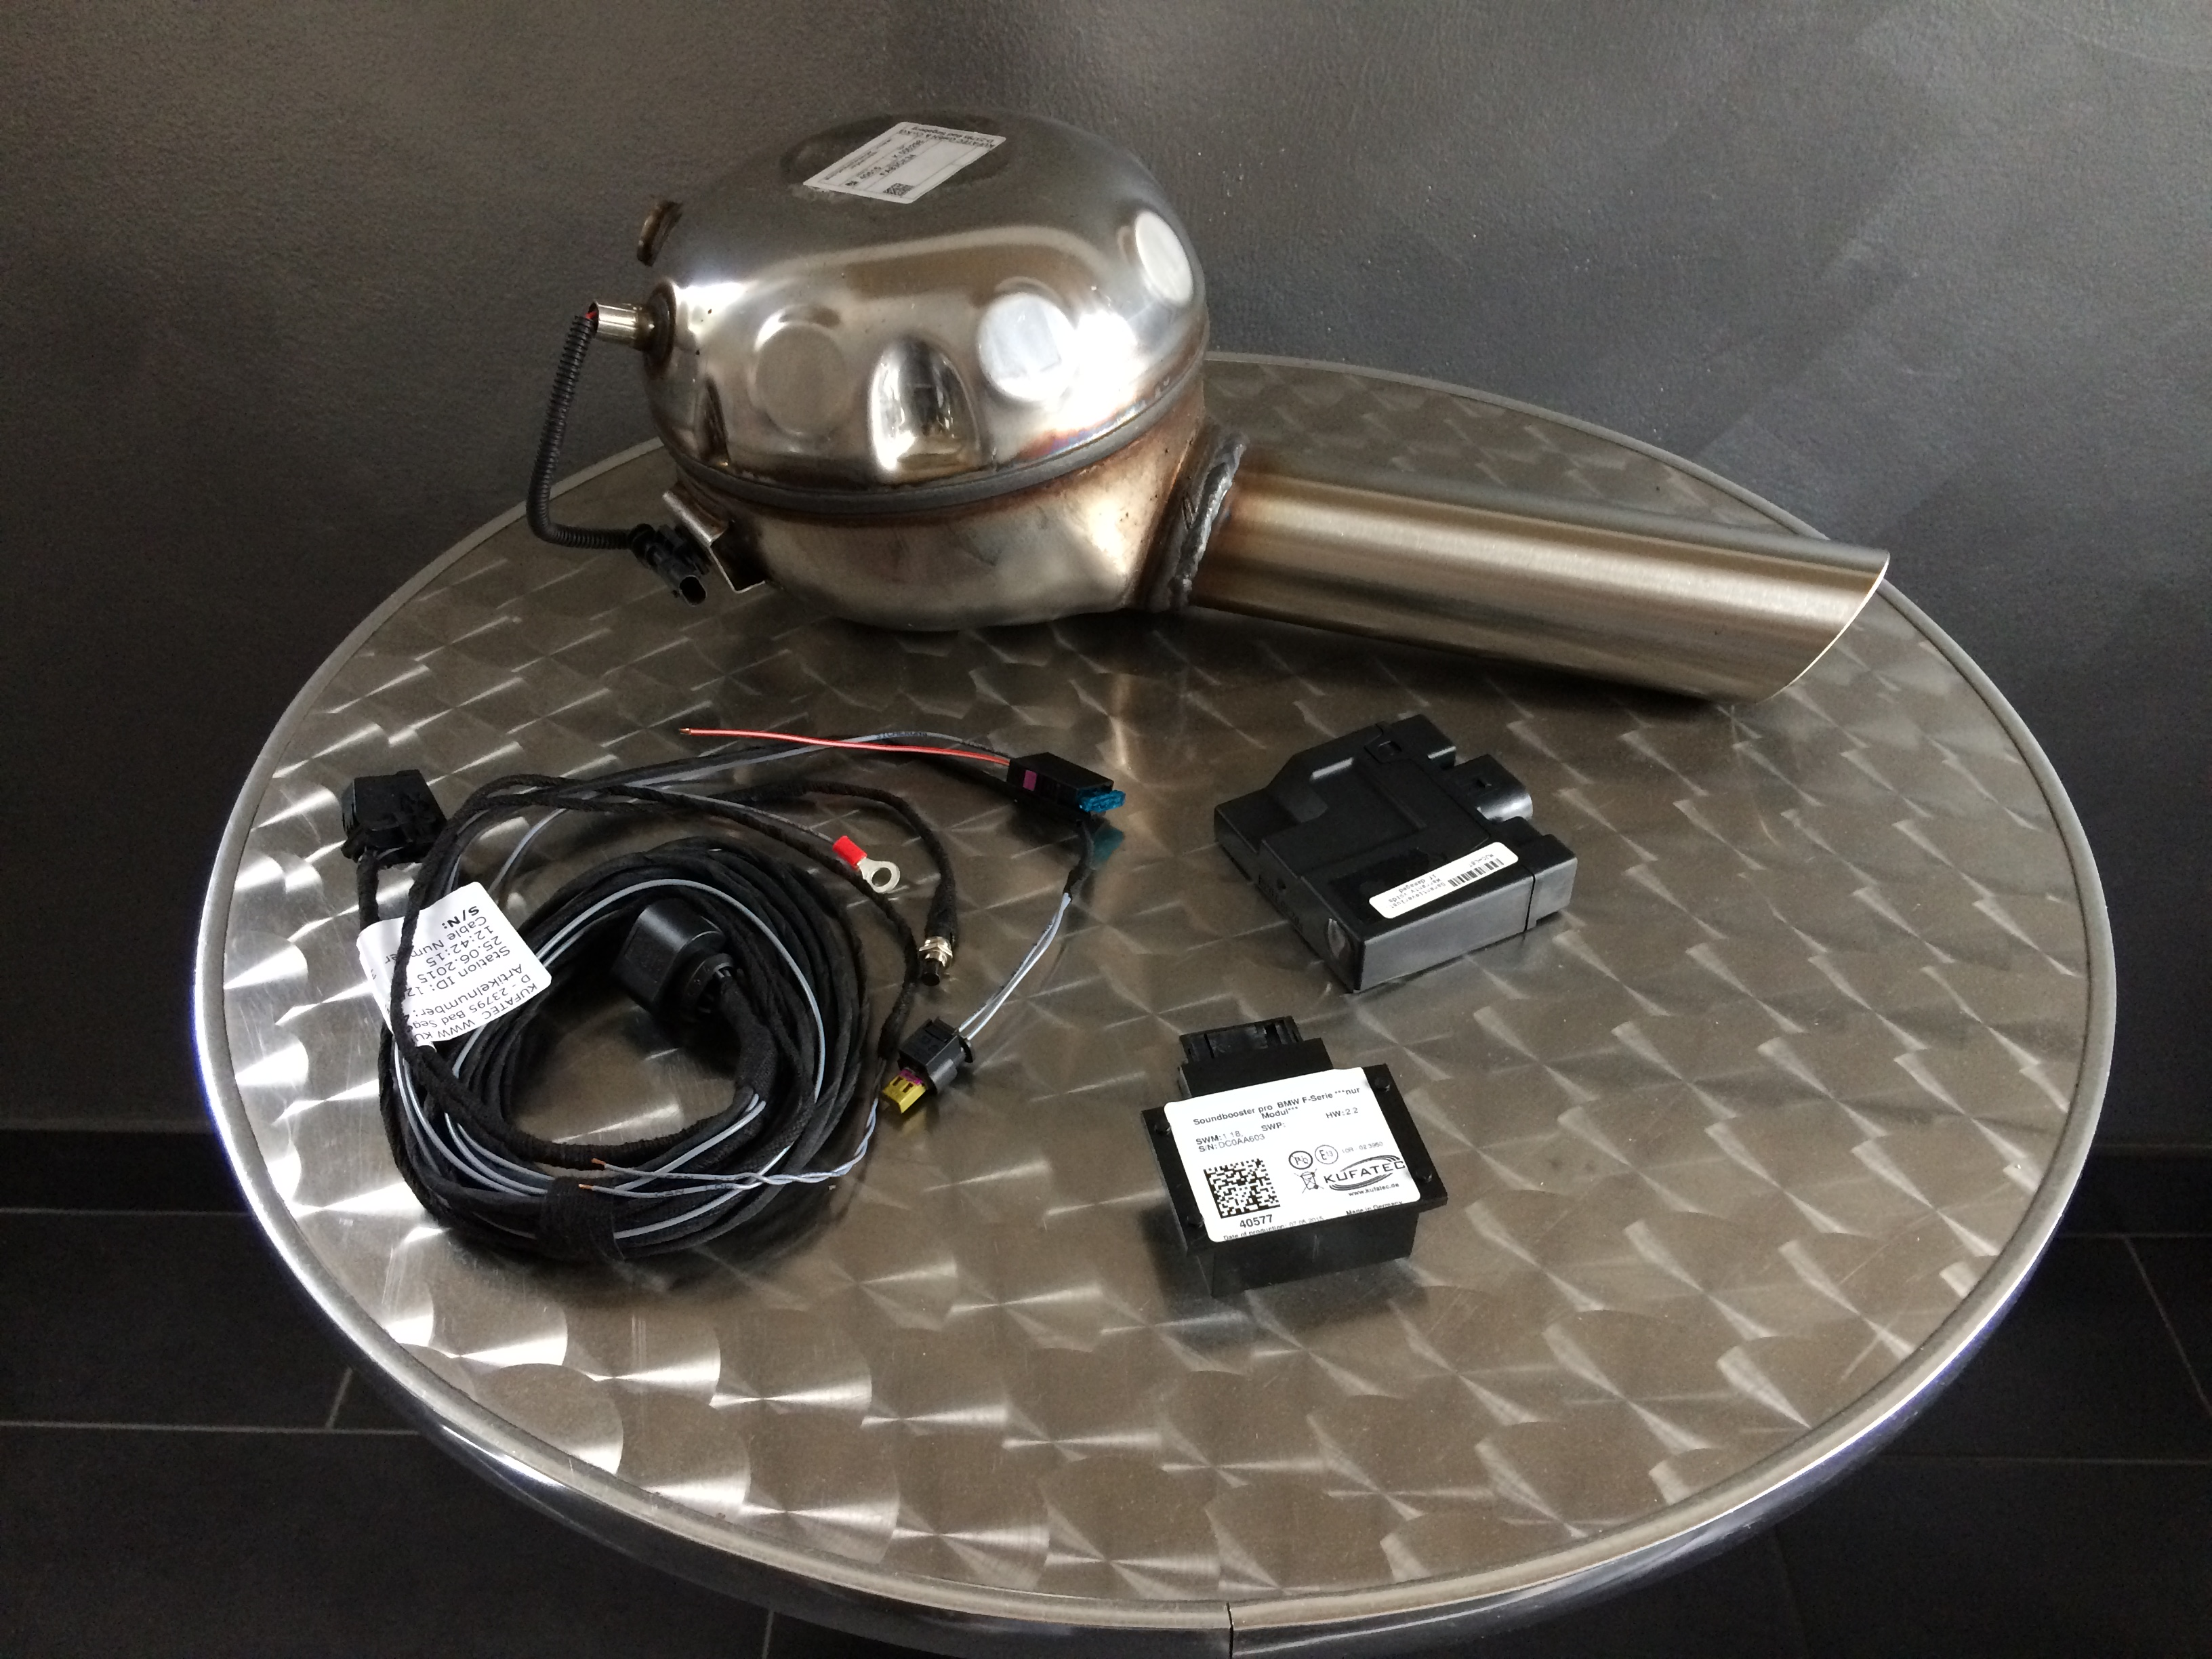 Sound Booster Pro - Motor Active Sound - Opel - inkl. 19% Mehrwertsteuer + Versand